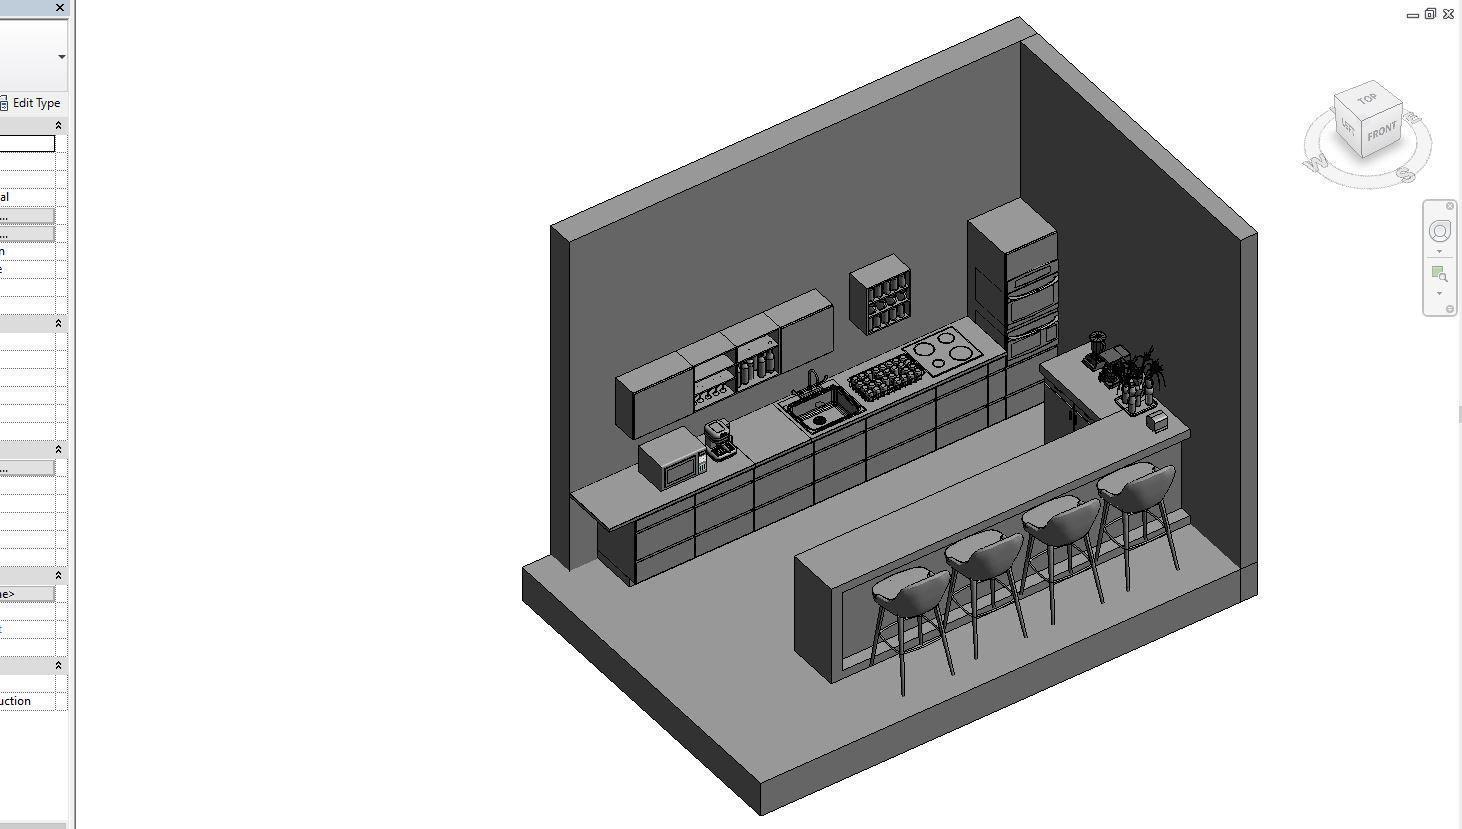 Kitchen for revit | 3D model